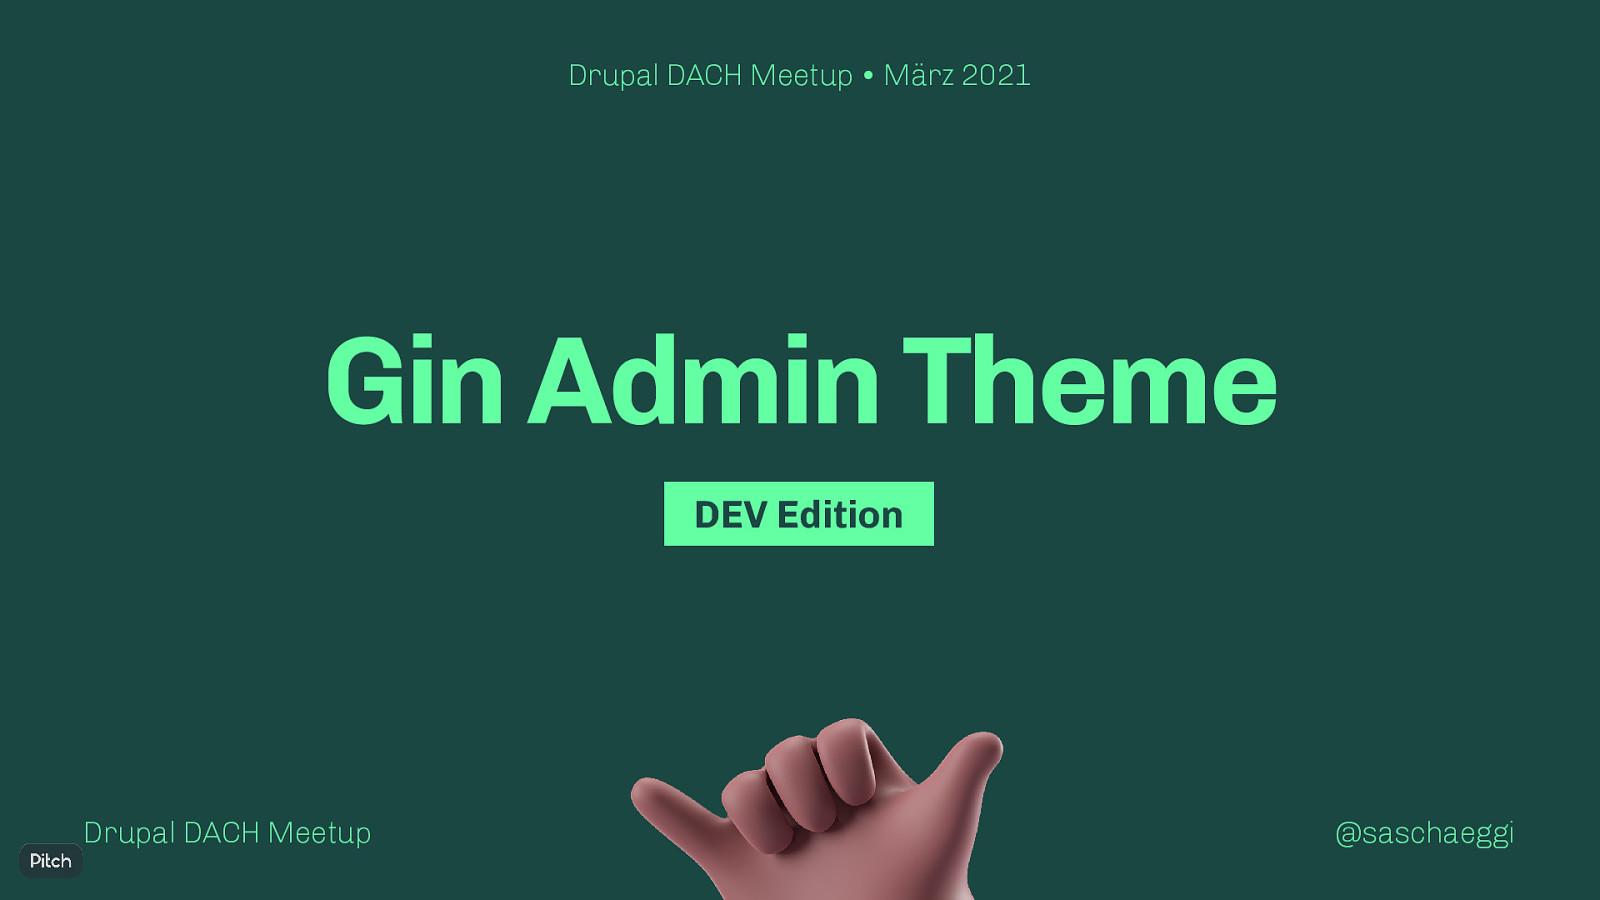 Gin Admin Theme (DEV Edition, German)